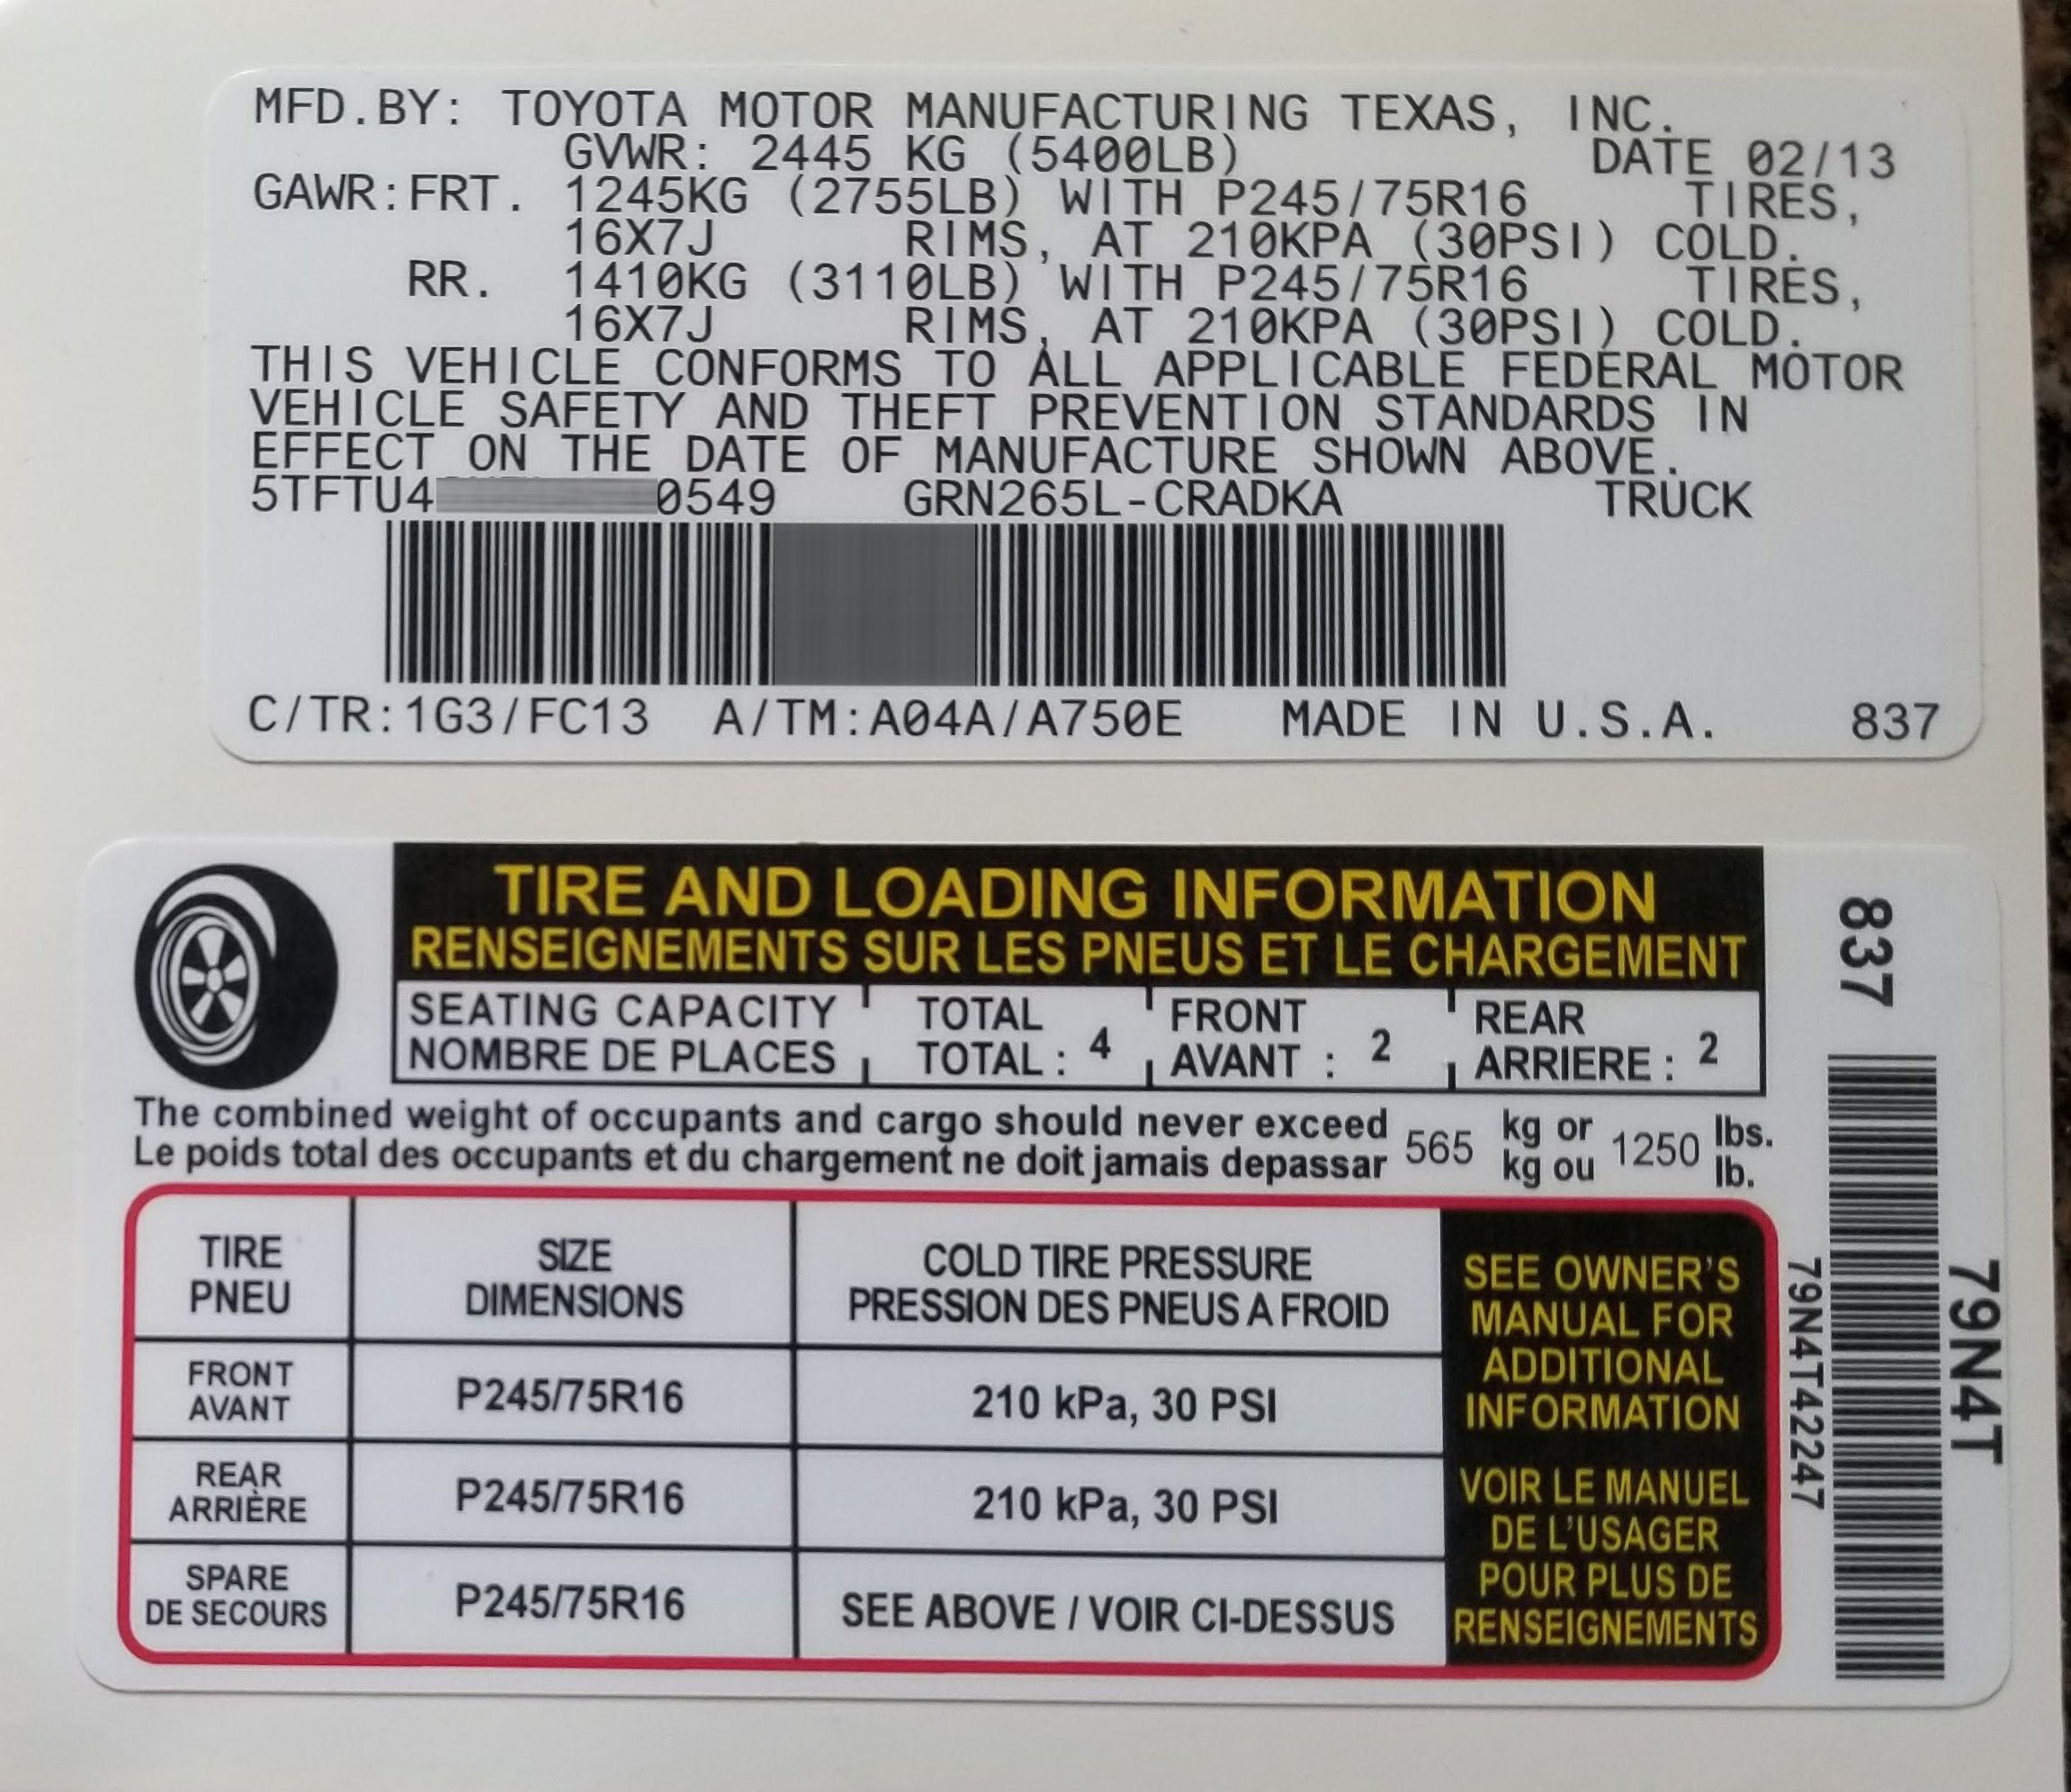 Toyota Tire Pressure Sticker Toyota Labels Toyota Motors [ 1992 x 2302 Pixel ]